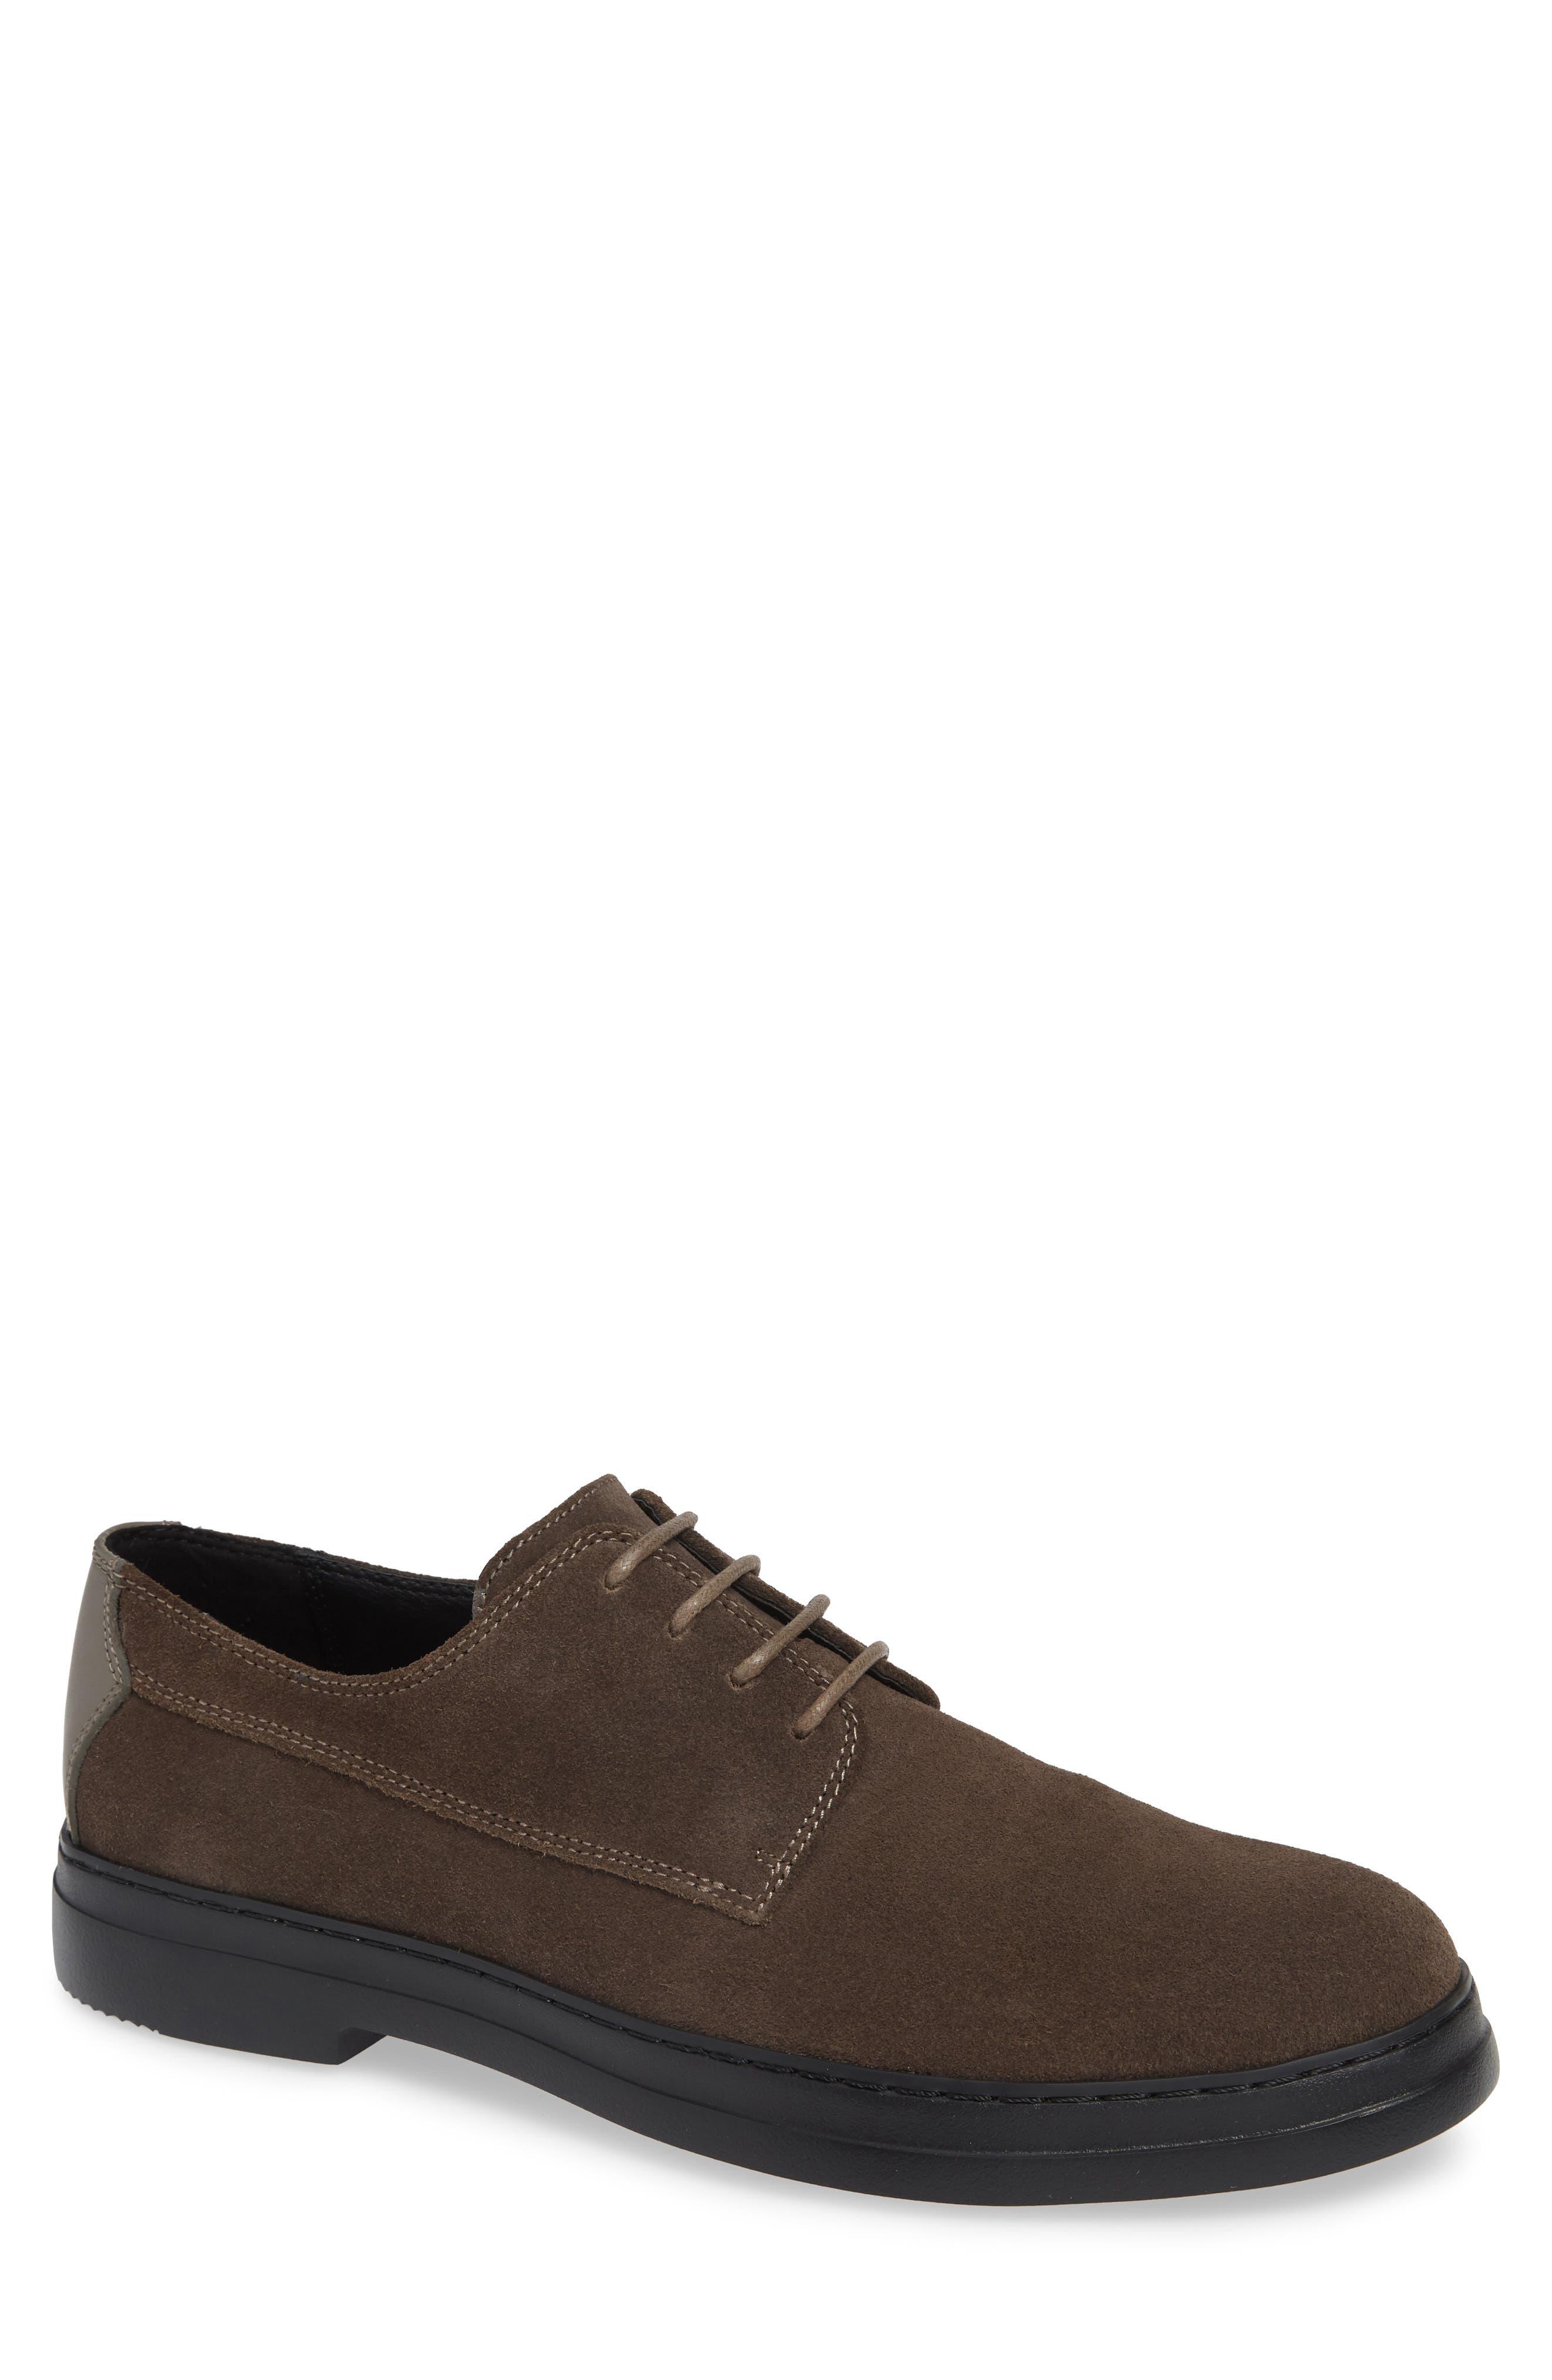 Rickie Buck Shoe,                         Main,                         color, GREY STONE CALF SUEDE